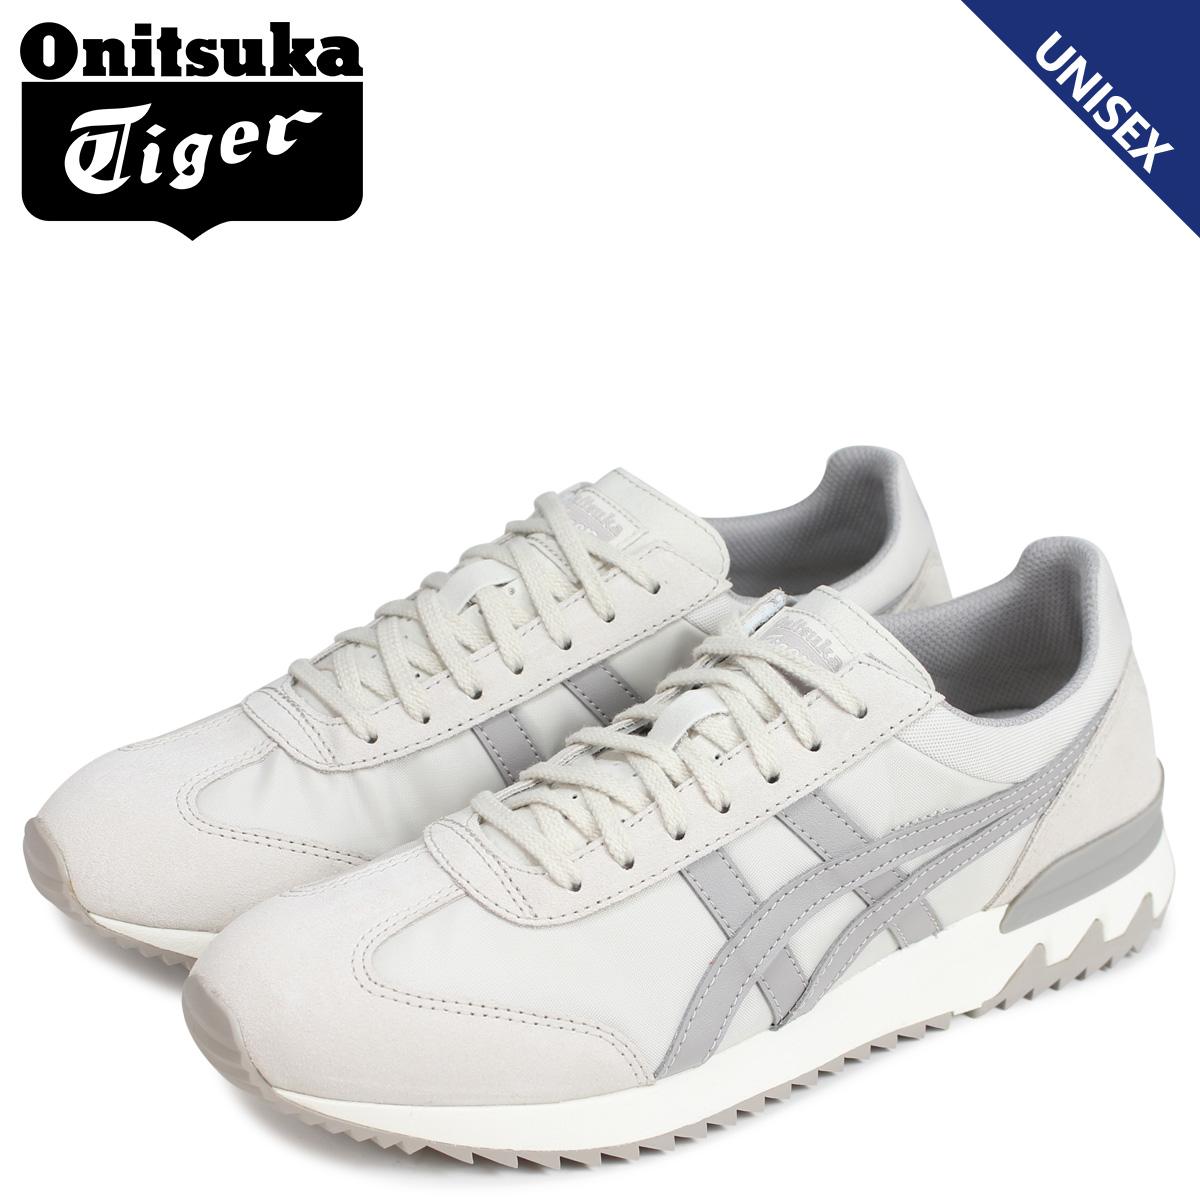 new style e6e48 acfdc Onitsuka Tiger 78, California Onitsuka tiger CALIFORNIA 78 EX men gap Dis  sneakers 1183A194-250 white white